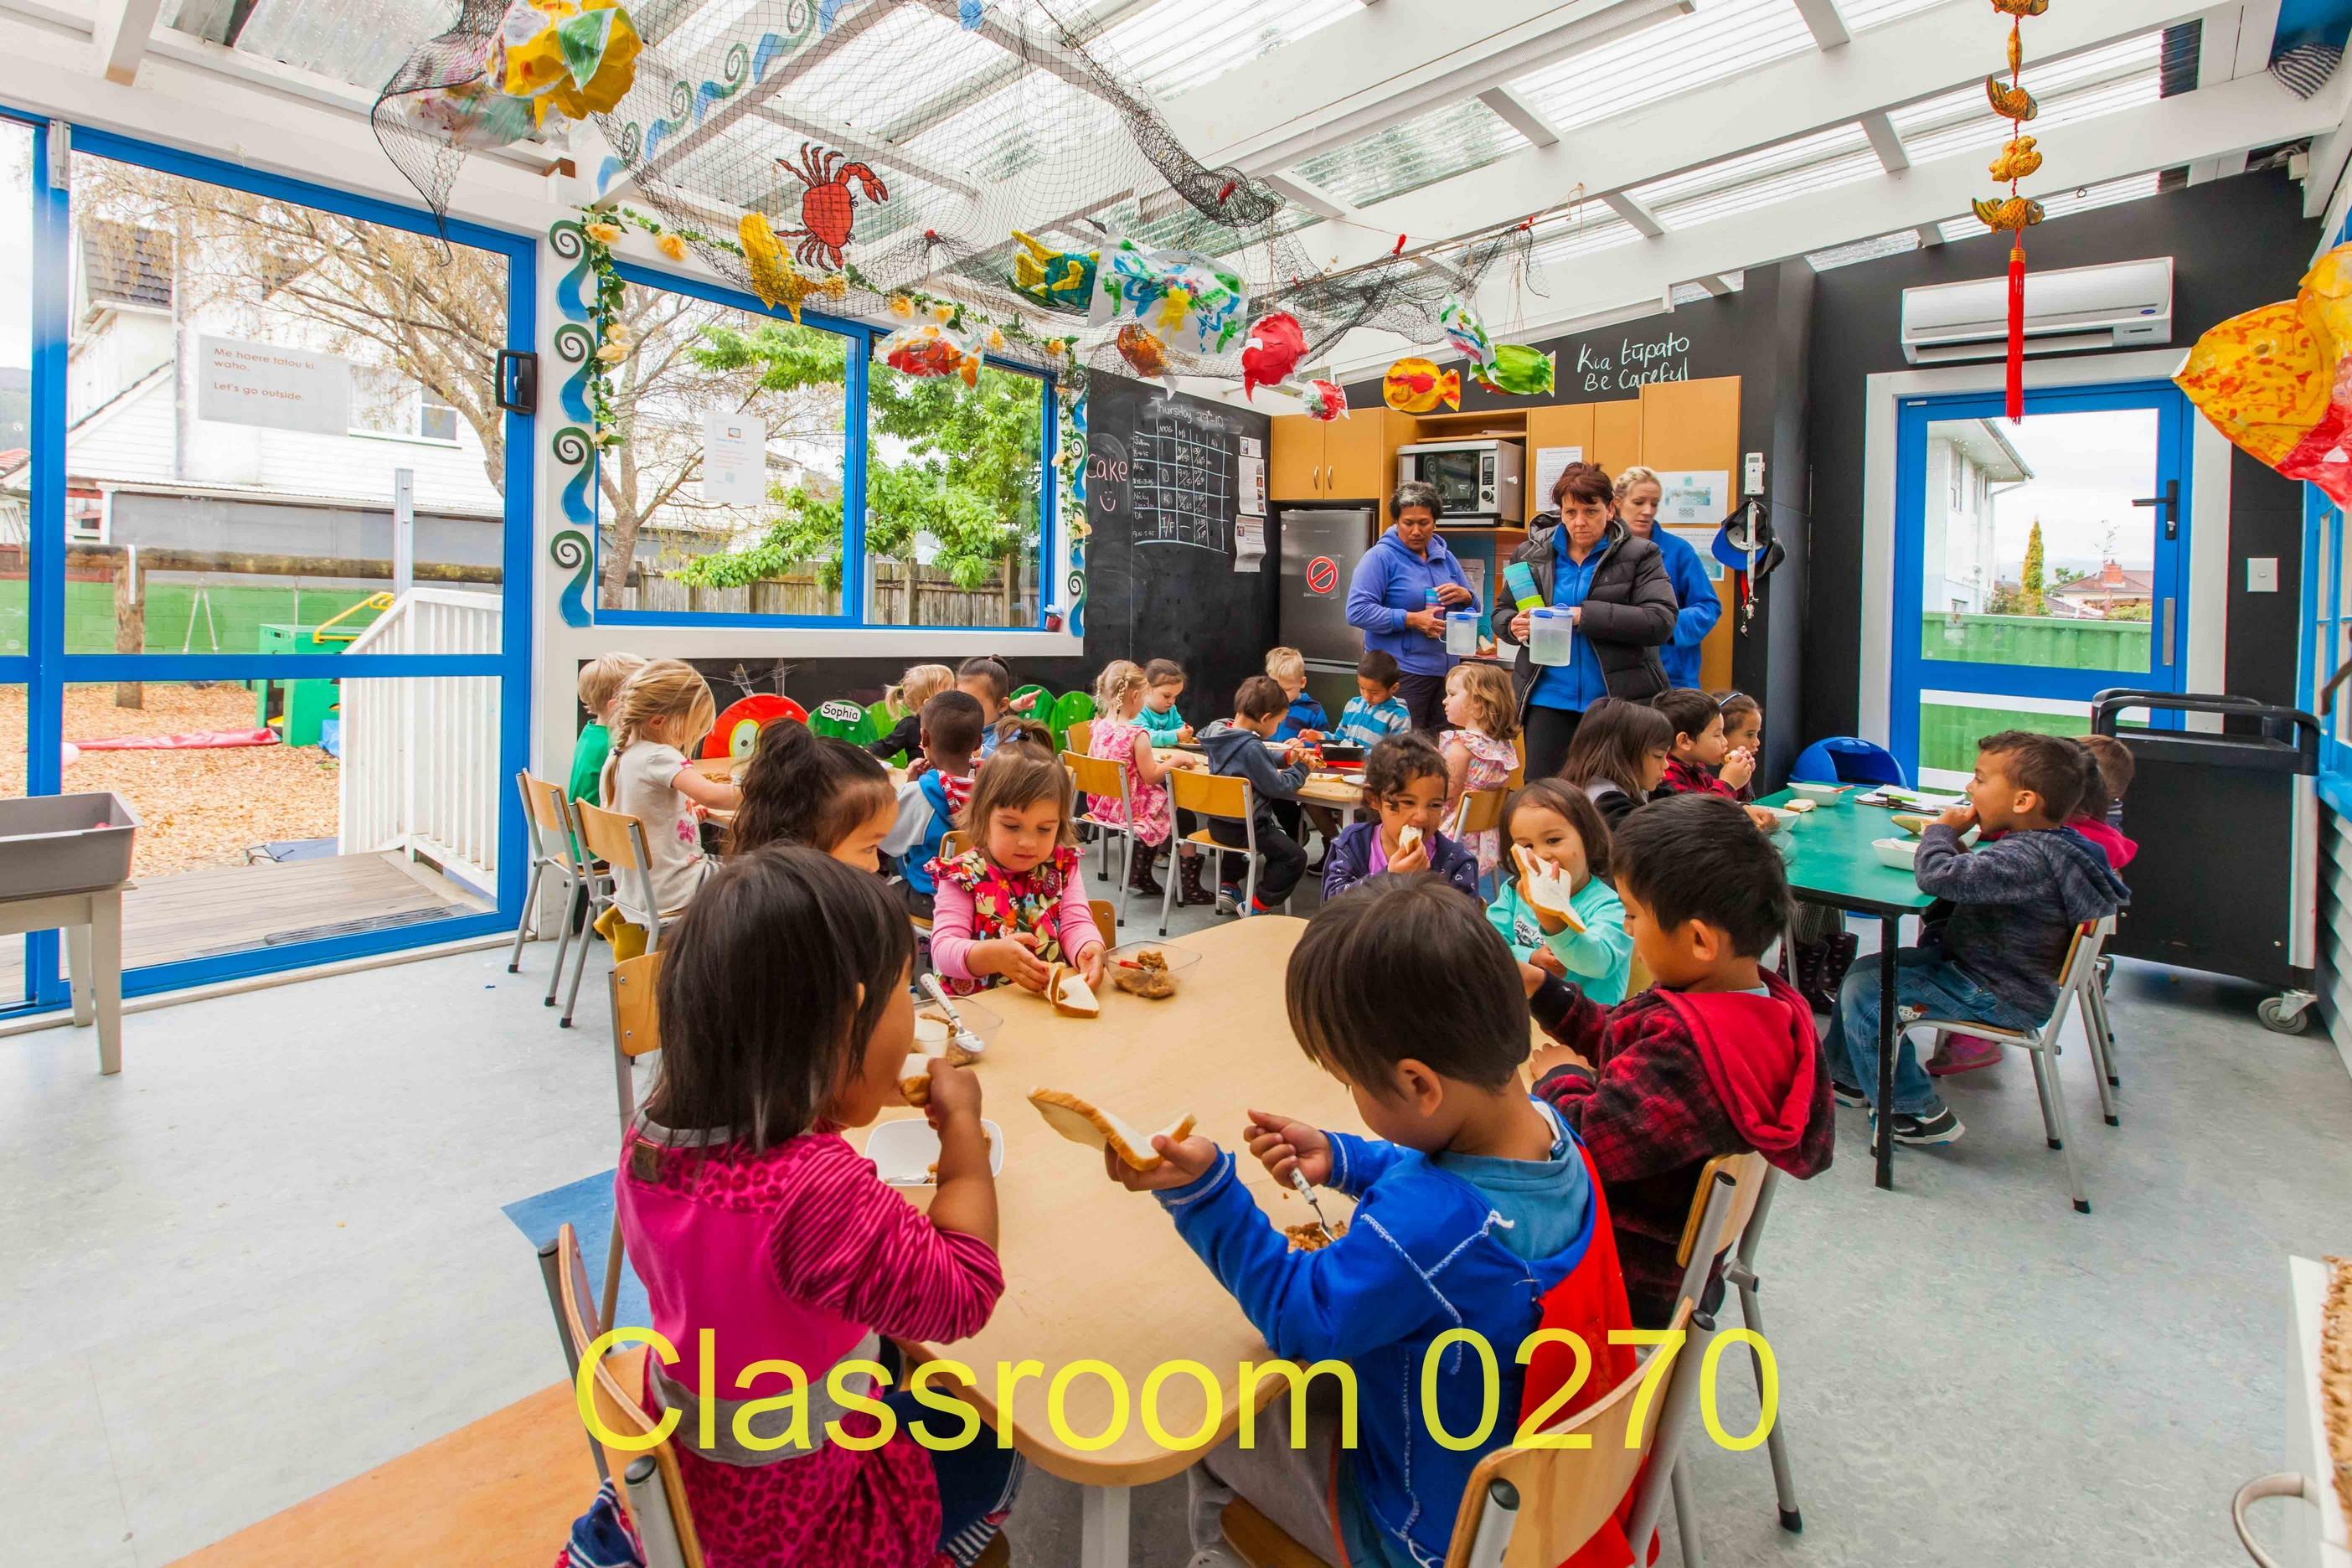 Classroom 0270